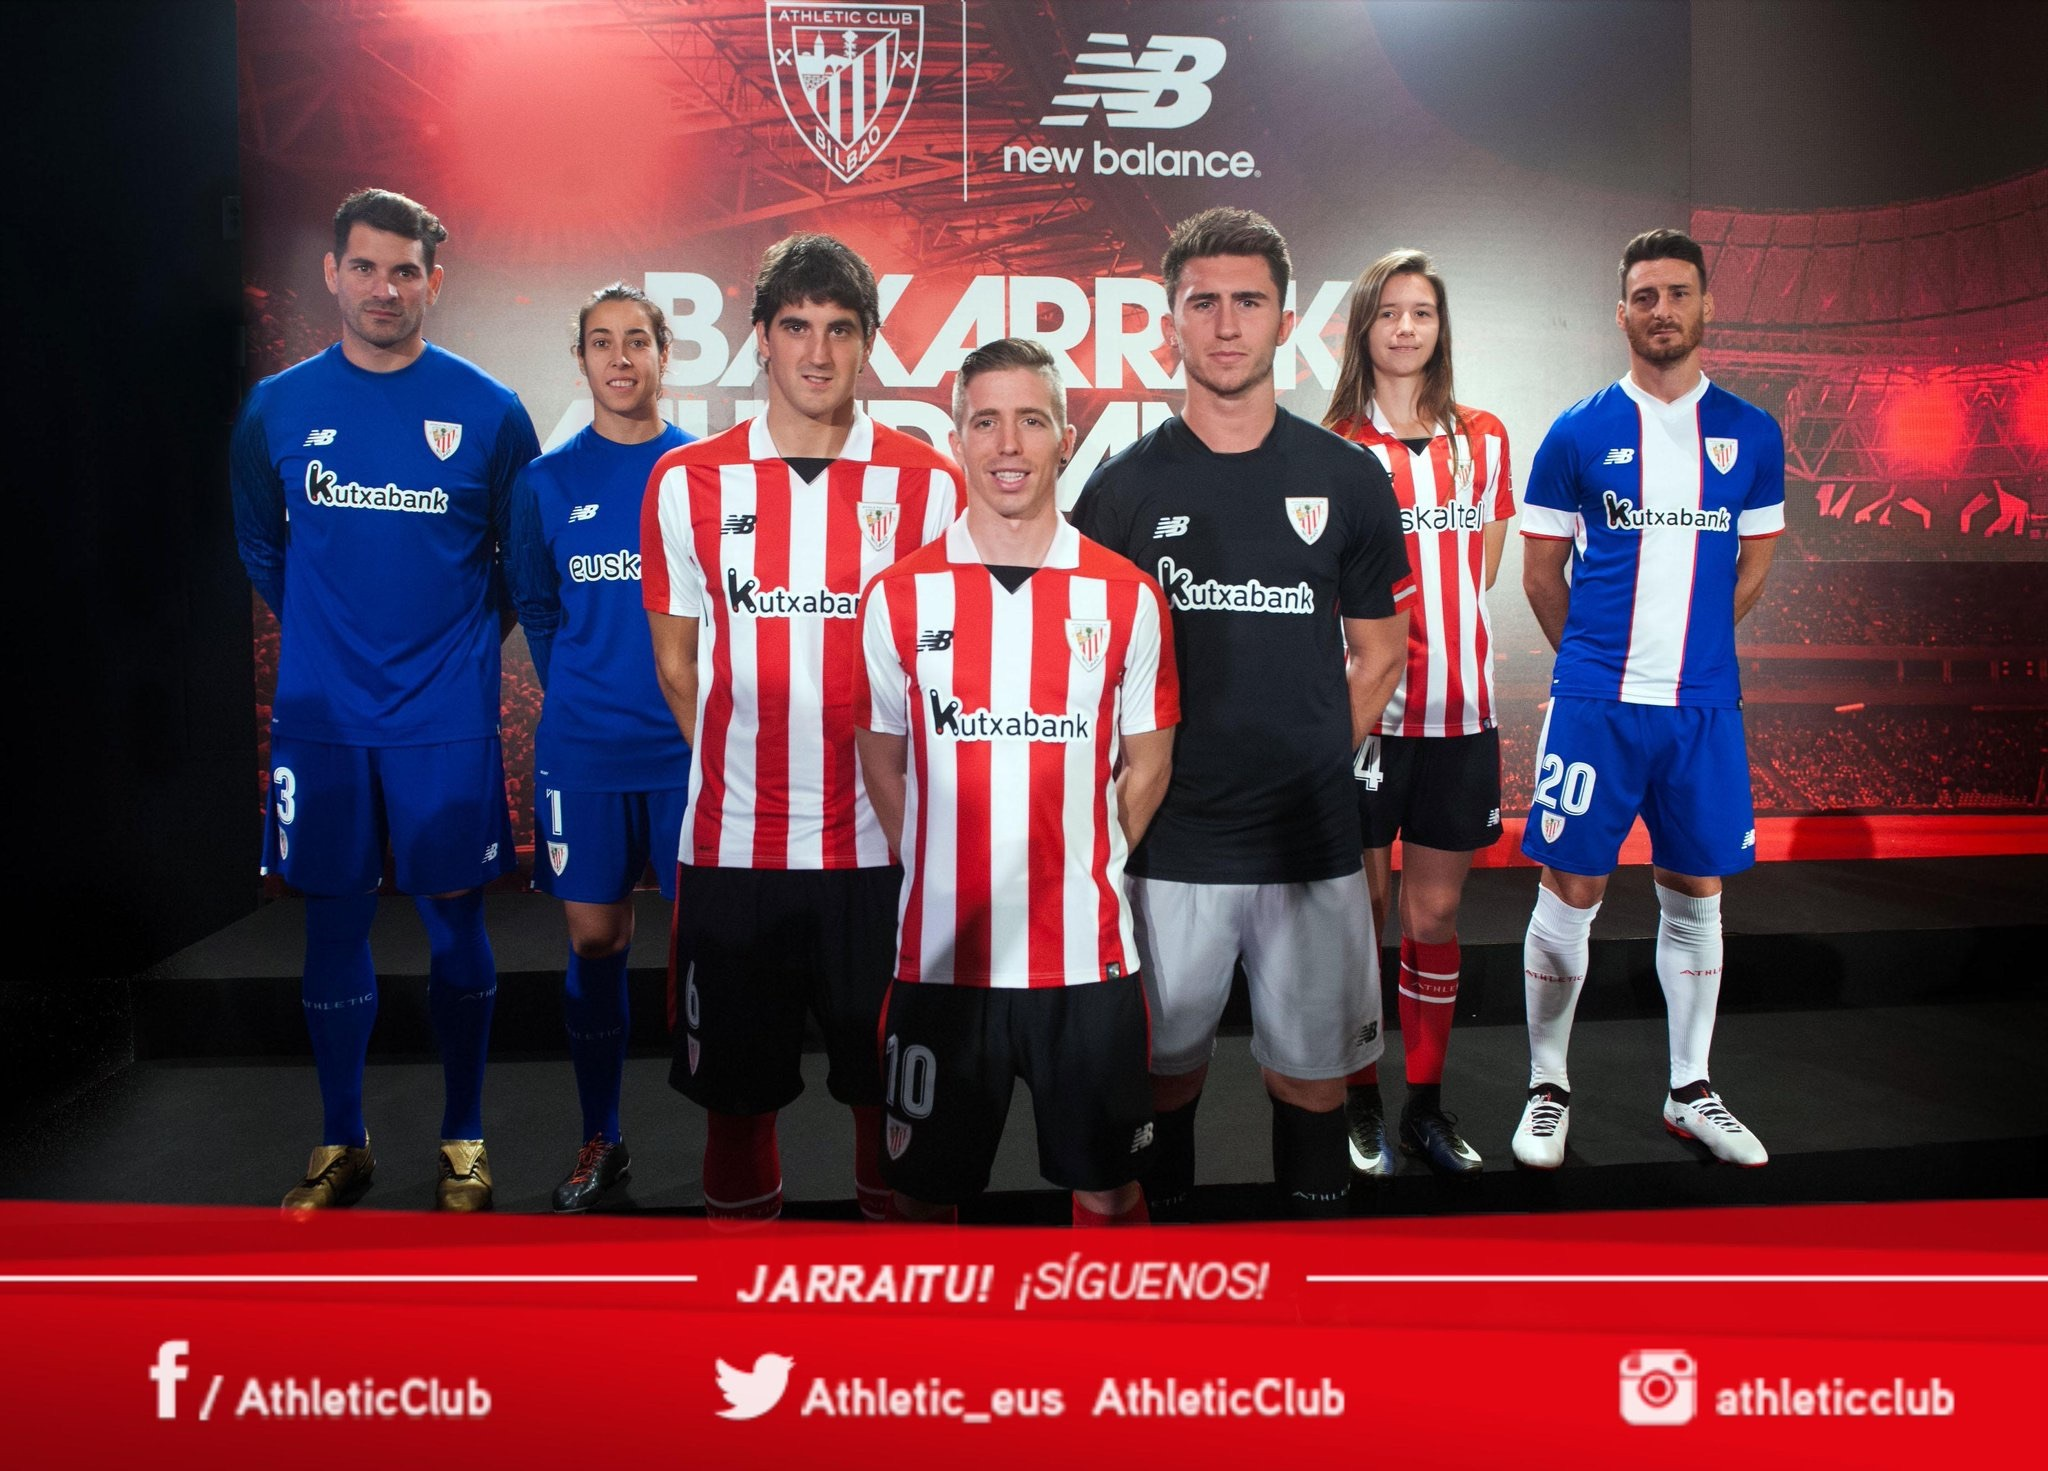 equipacion Athletic Club futbol